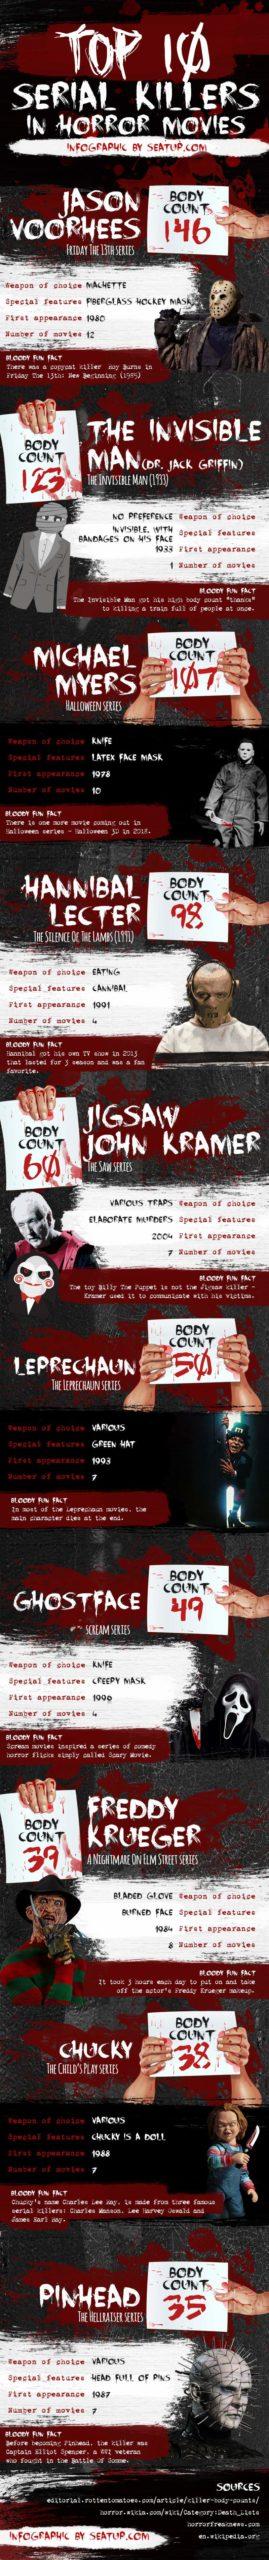 Top-10-Movie-Serial-Killers-Body-Count